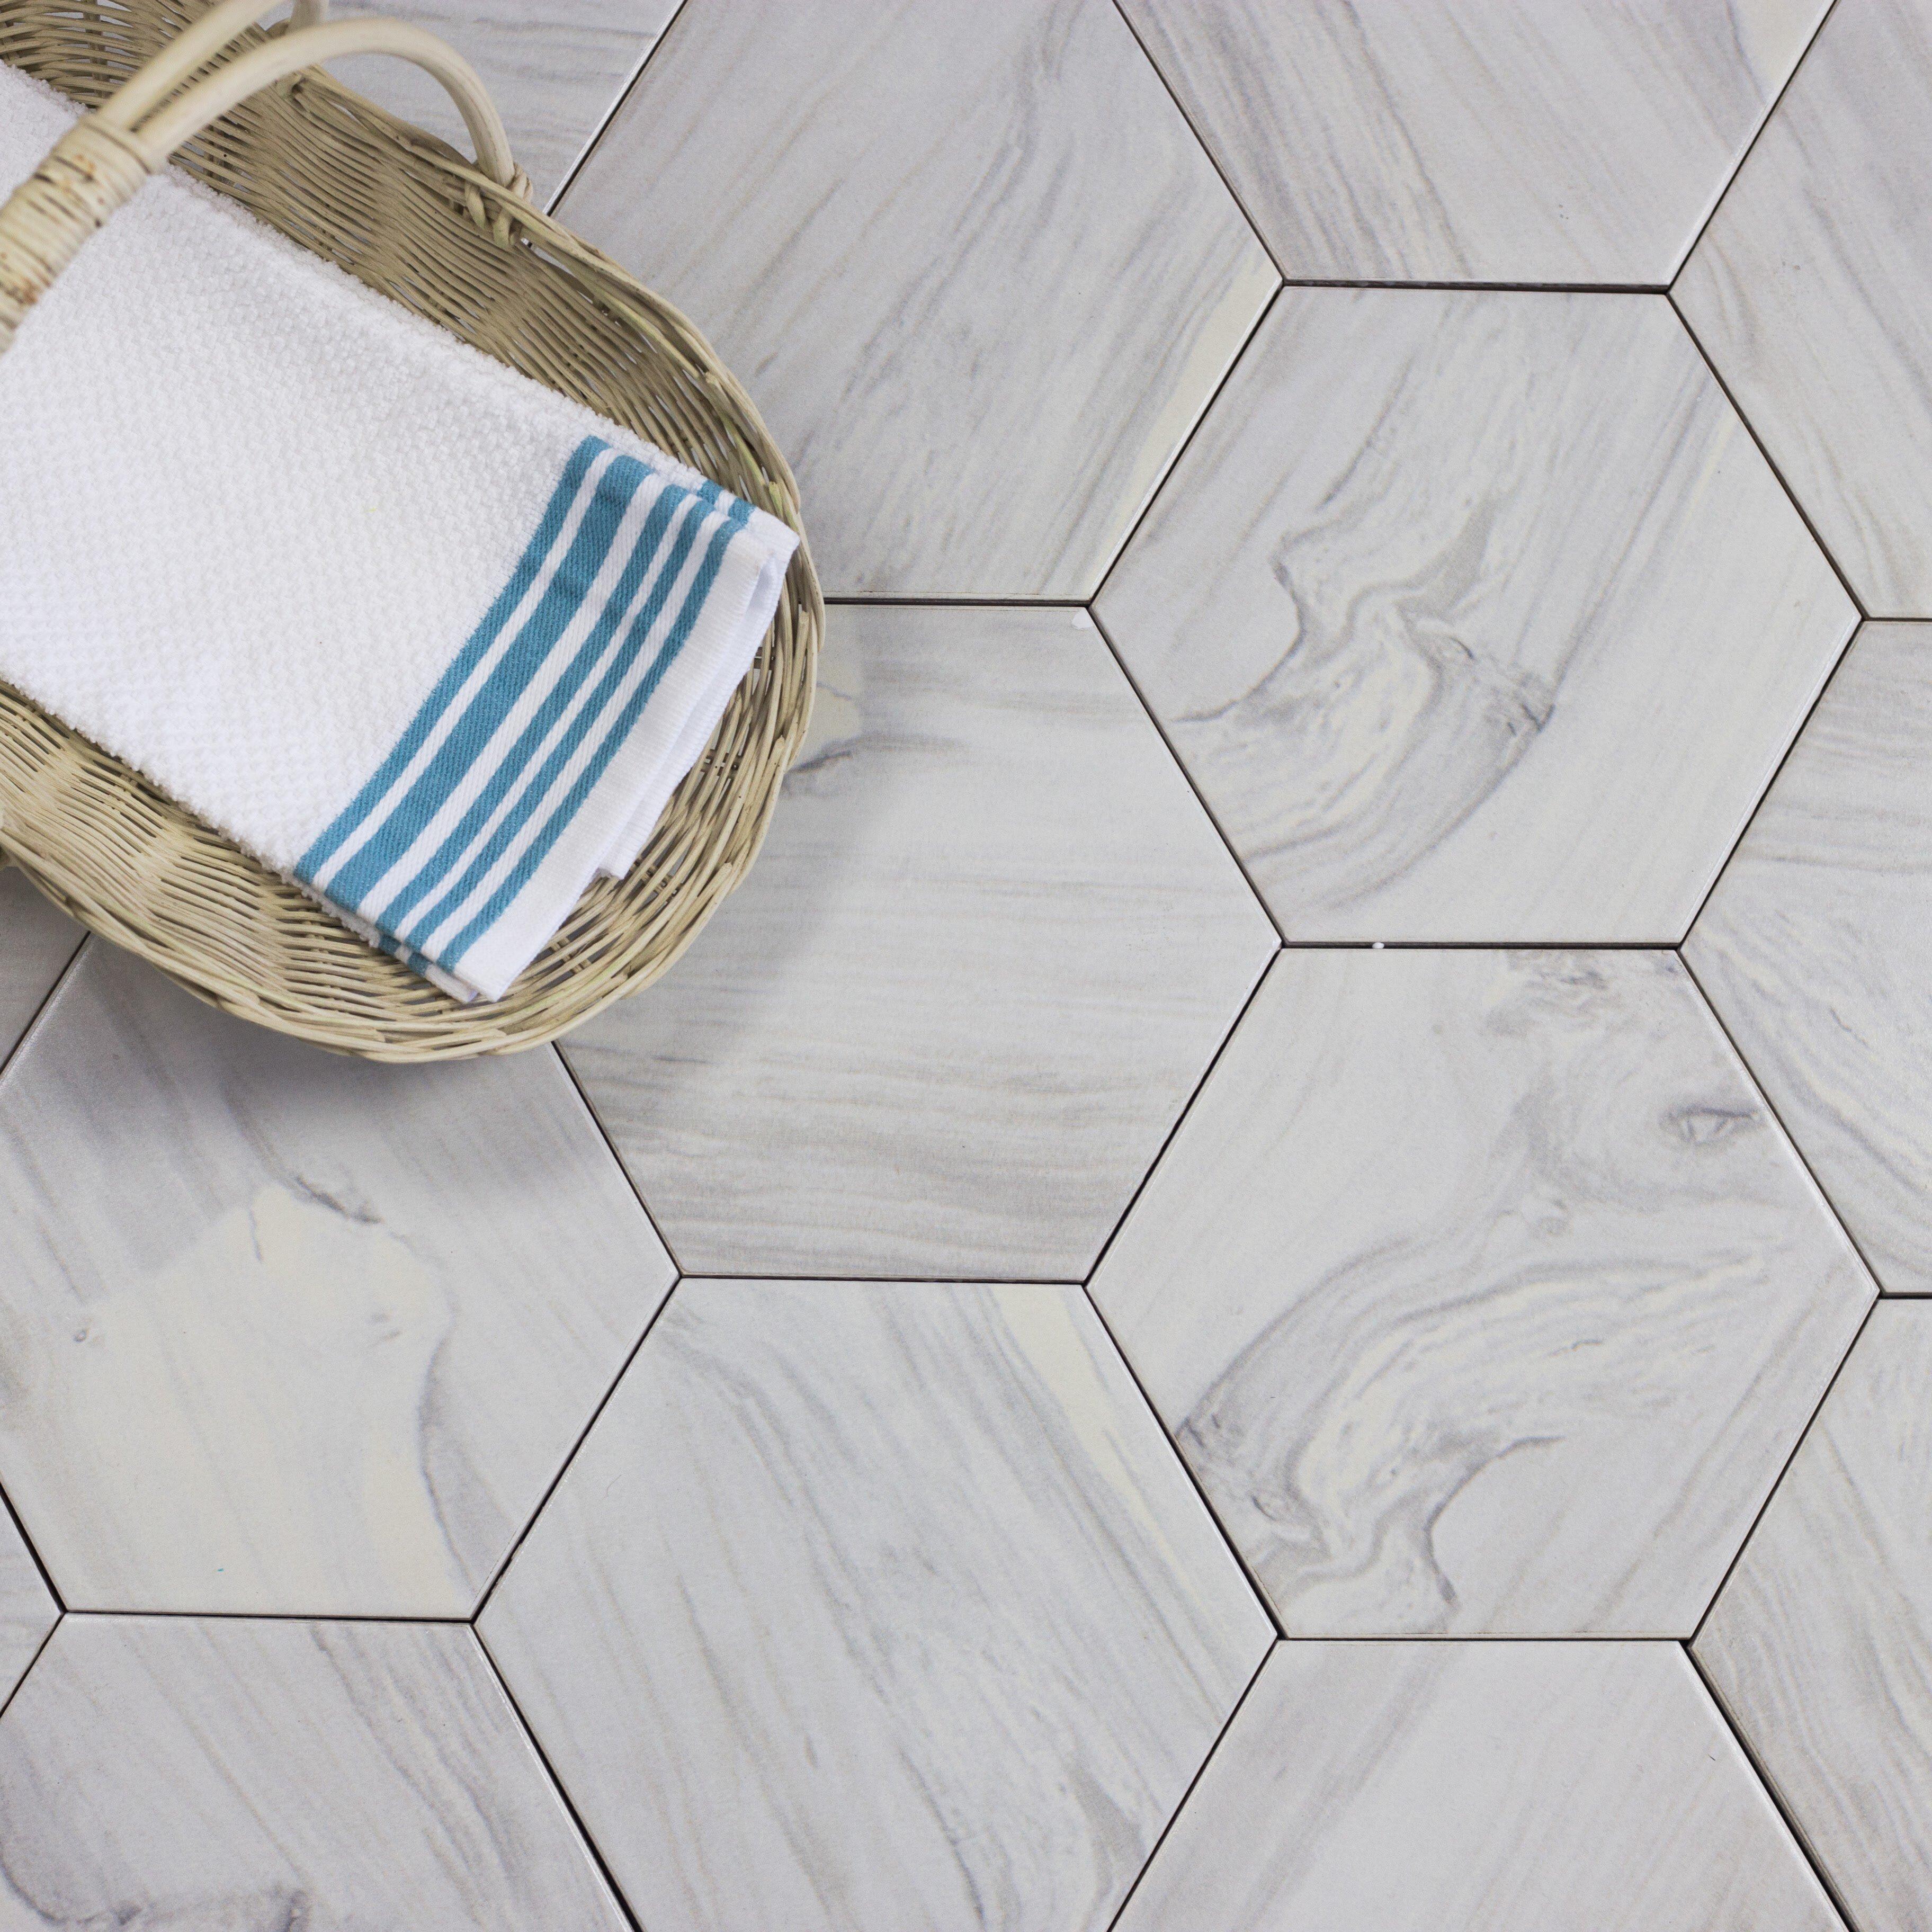 Abolos Artisan Wood Hexagon 8 X 8 Ceramic Wood Look Tile In White